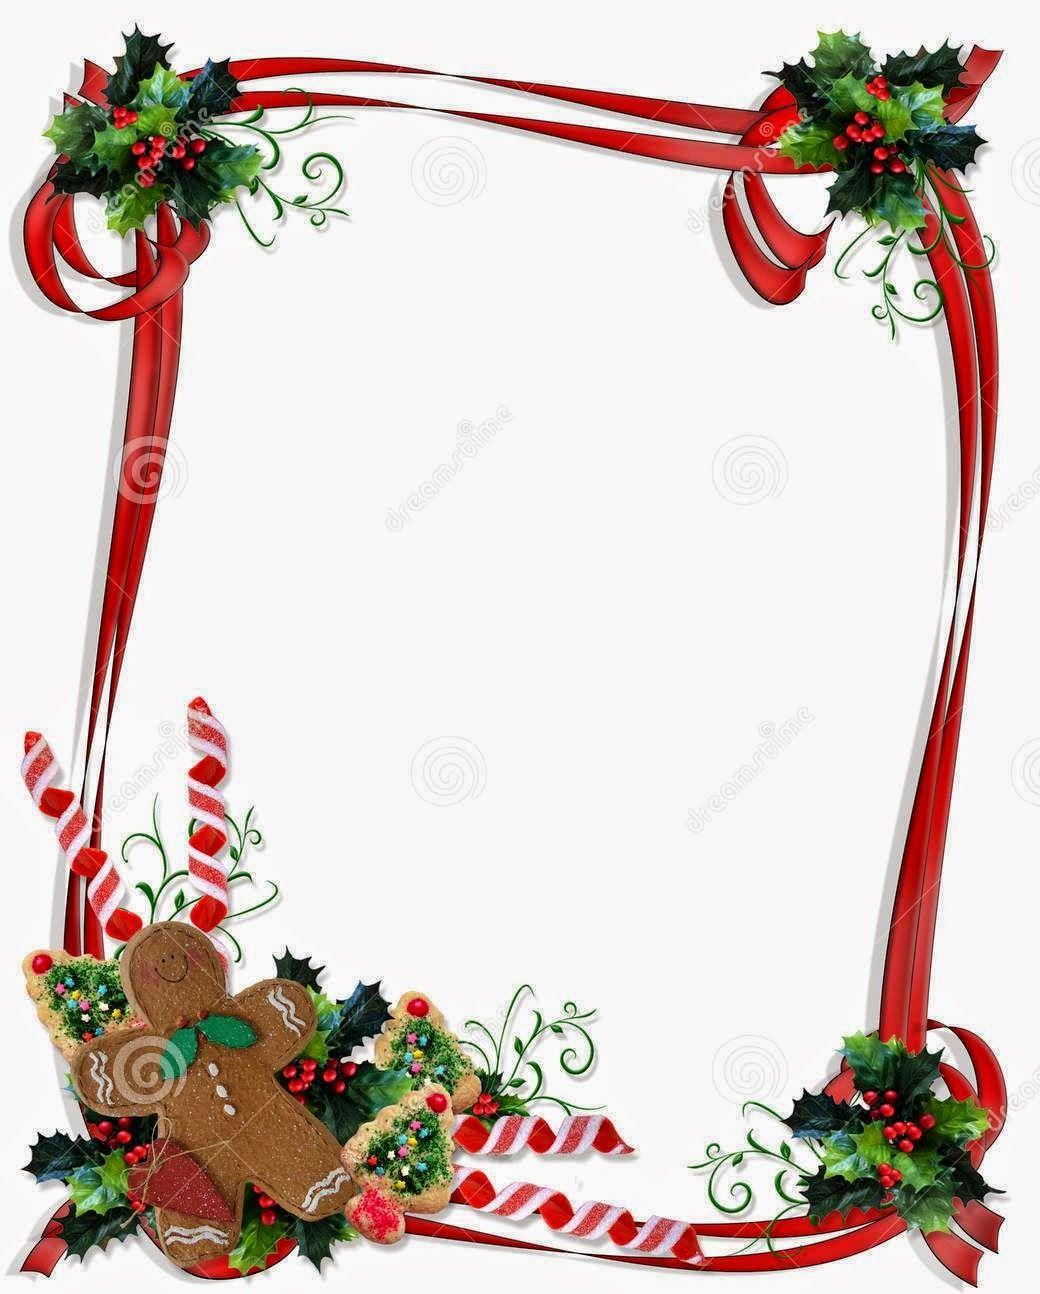 Christmas border clipart printable picture black and white stock Merry-Christmas-Day-2014-Border-Free-Printable-Download | Christmas ... picture black and white stock